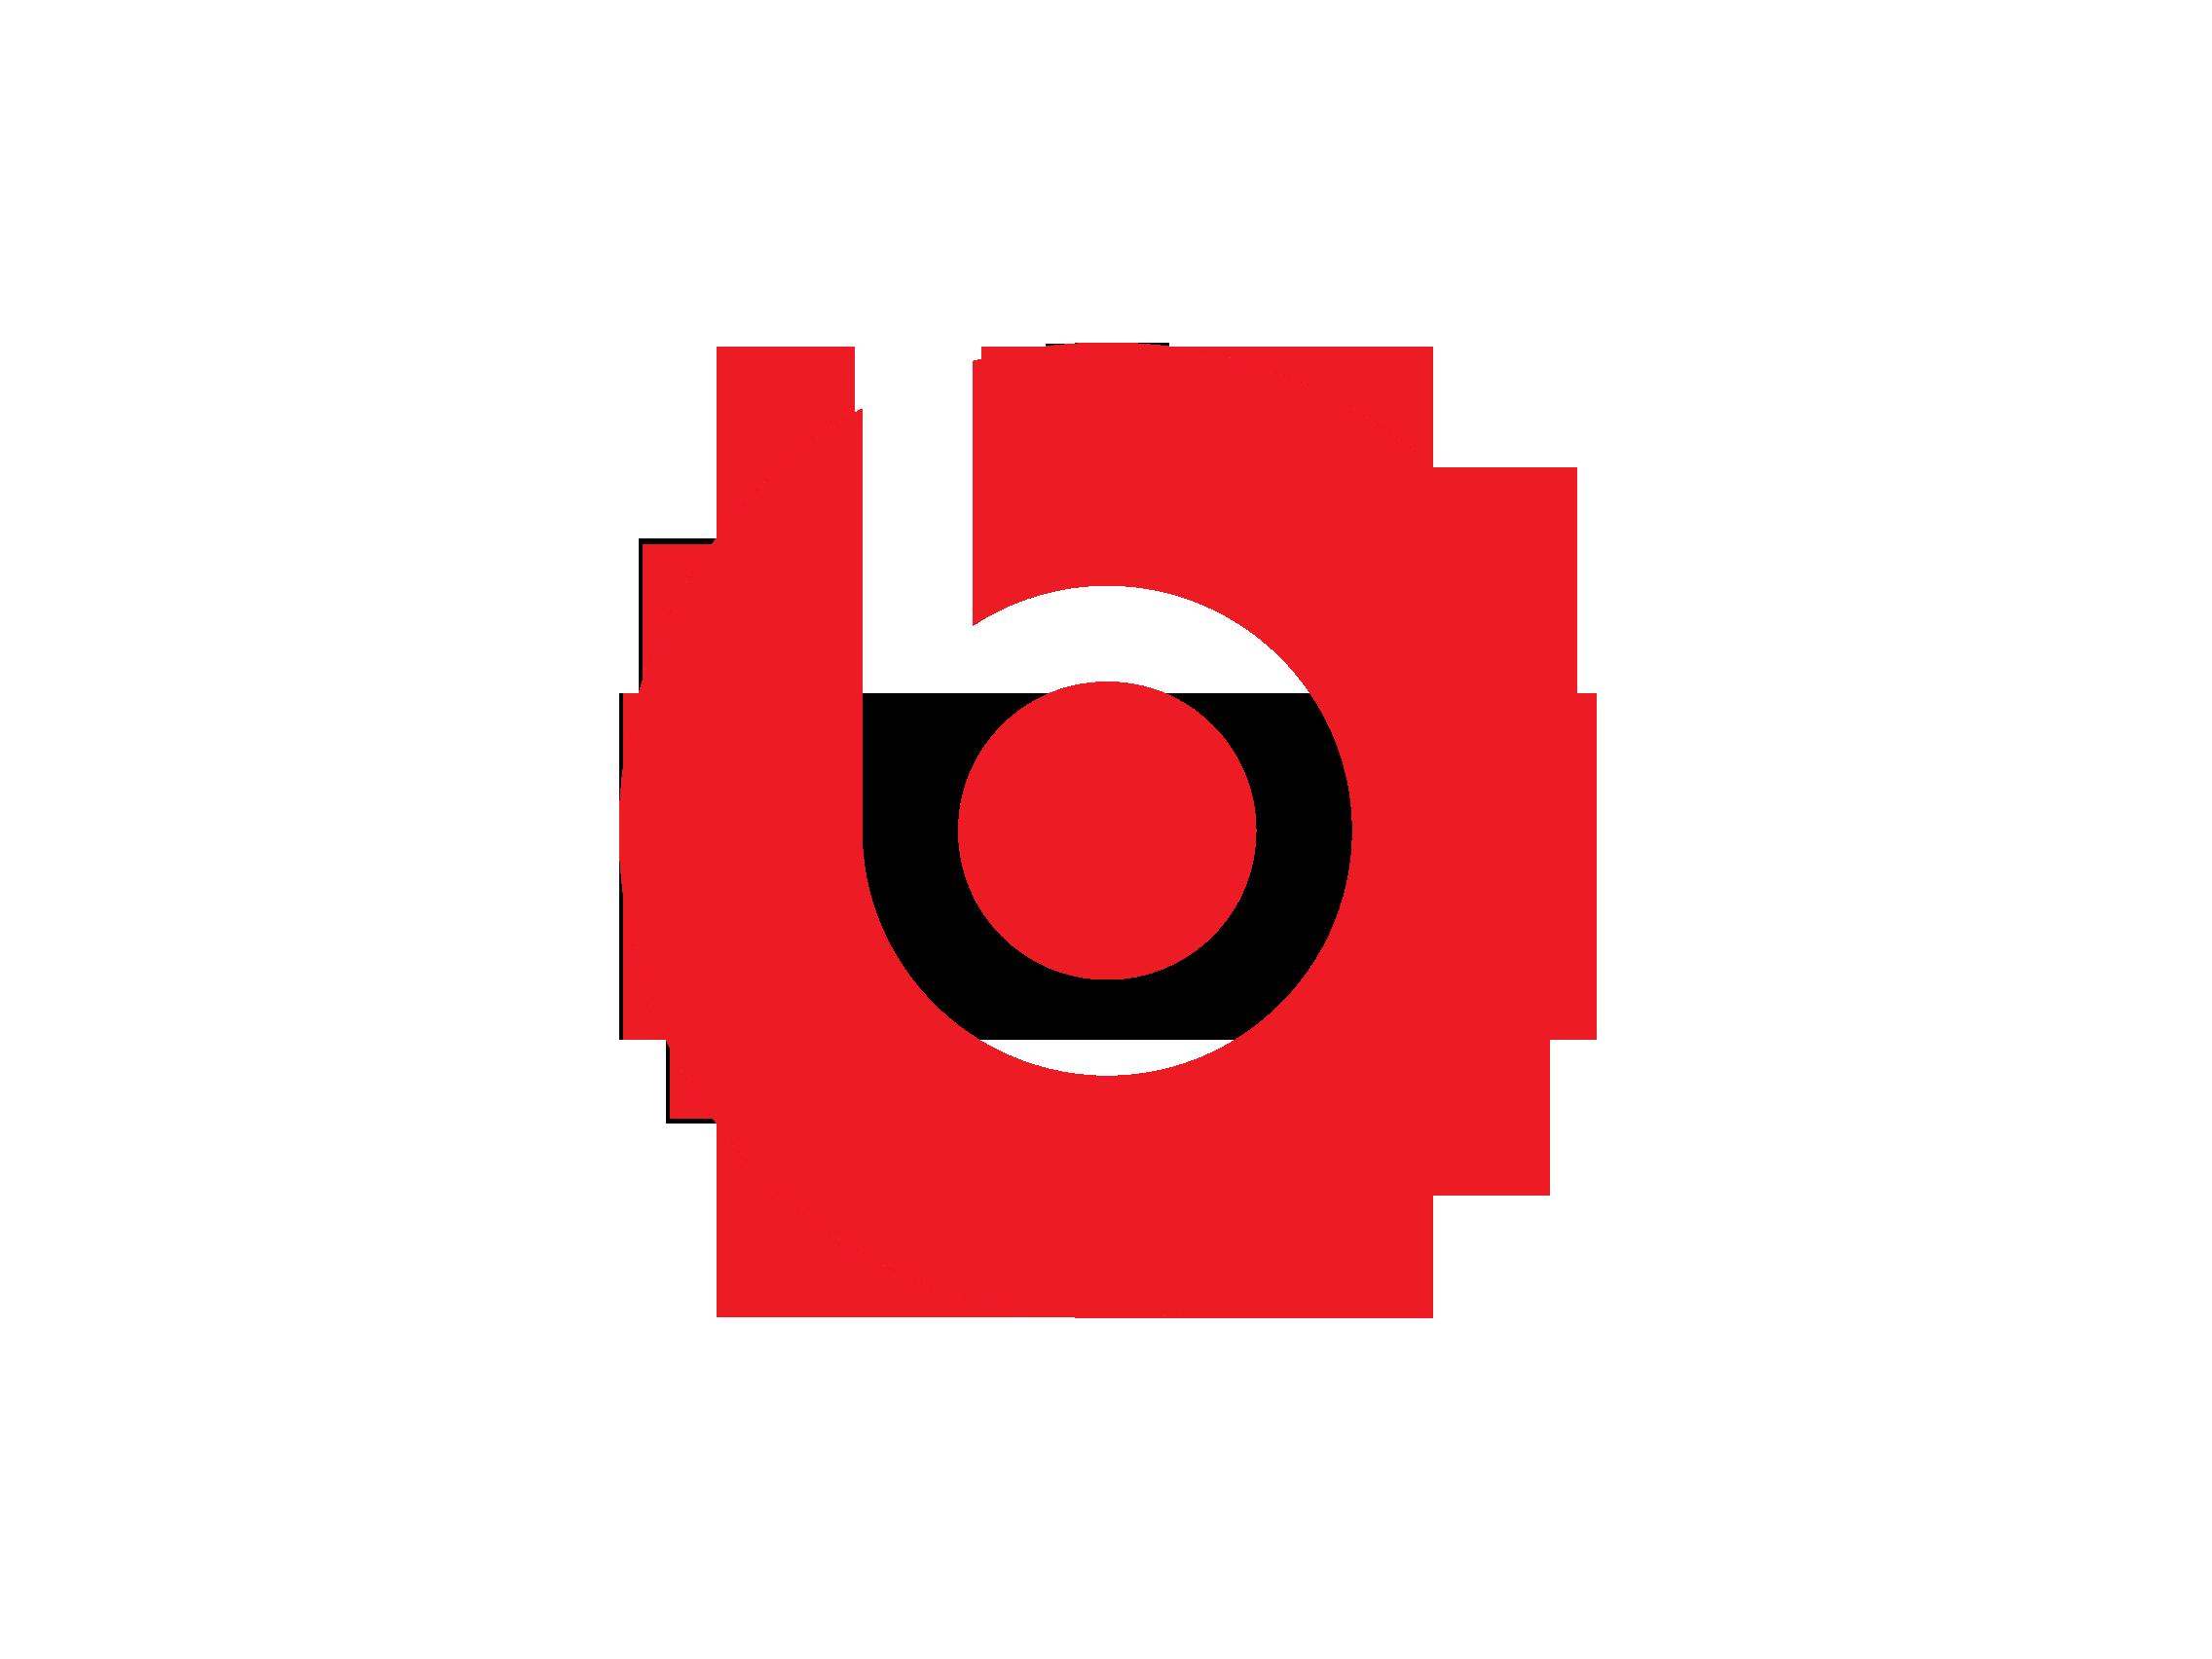 Beats Audio Logo Wallpaper